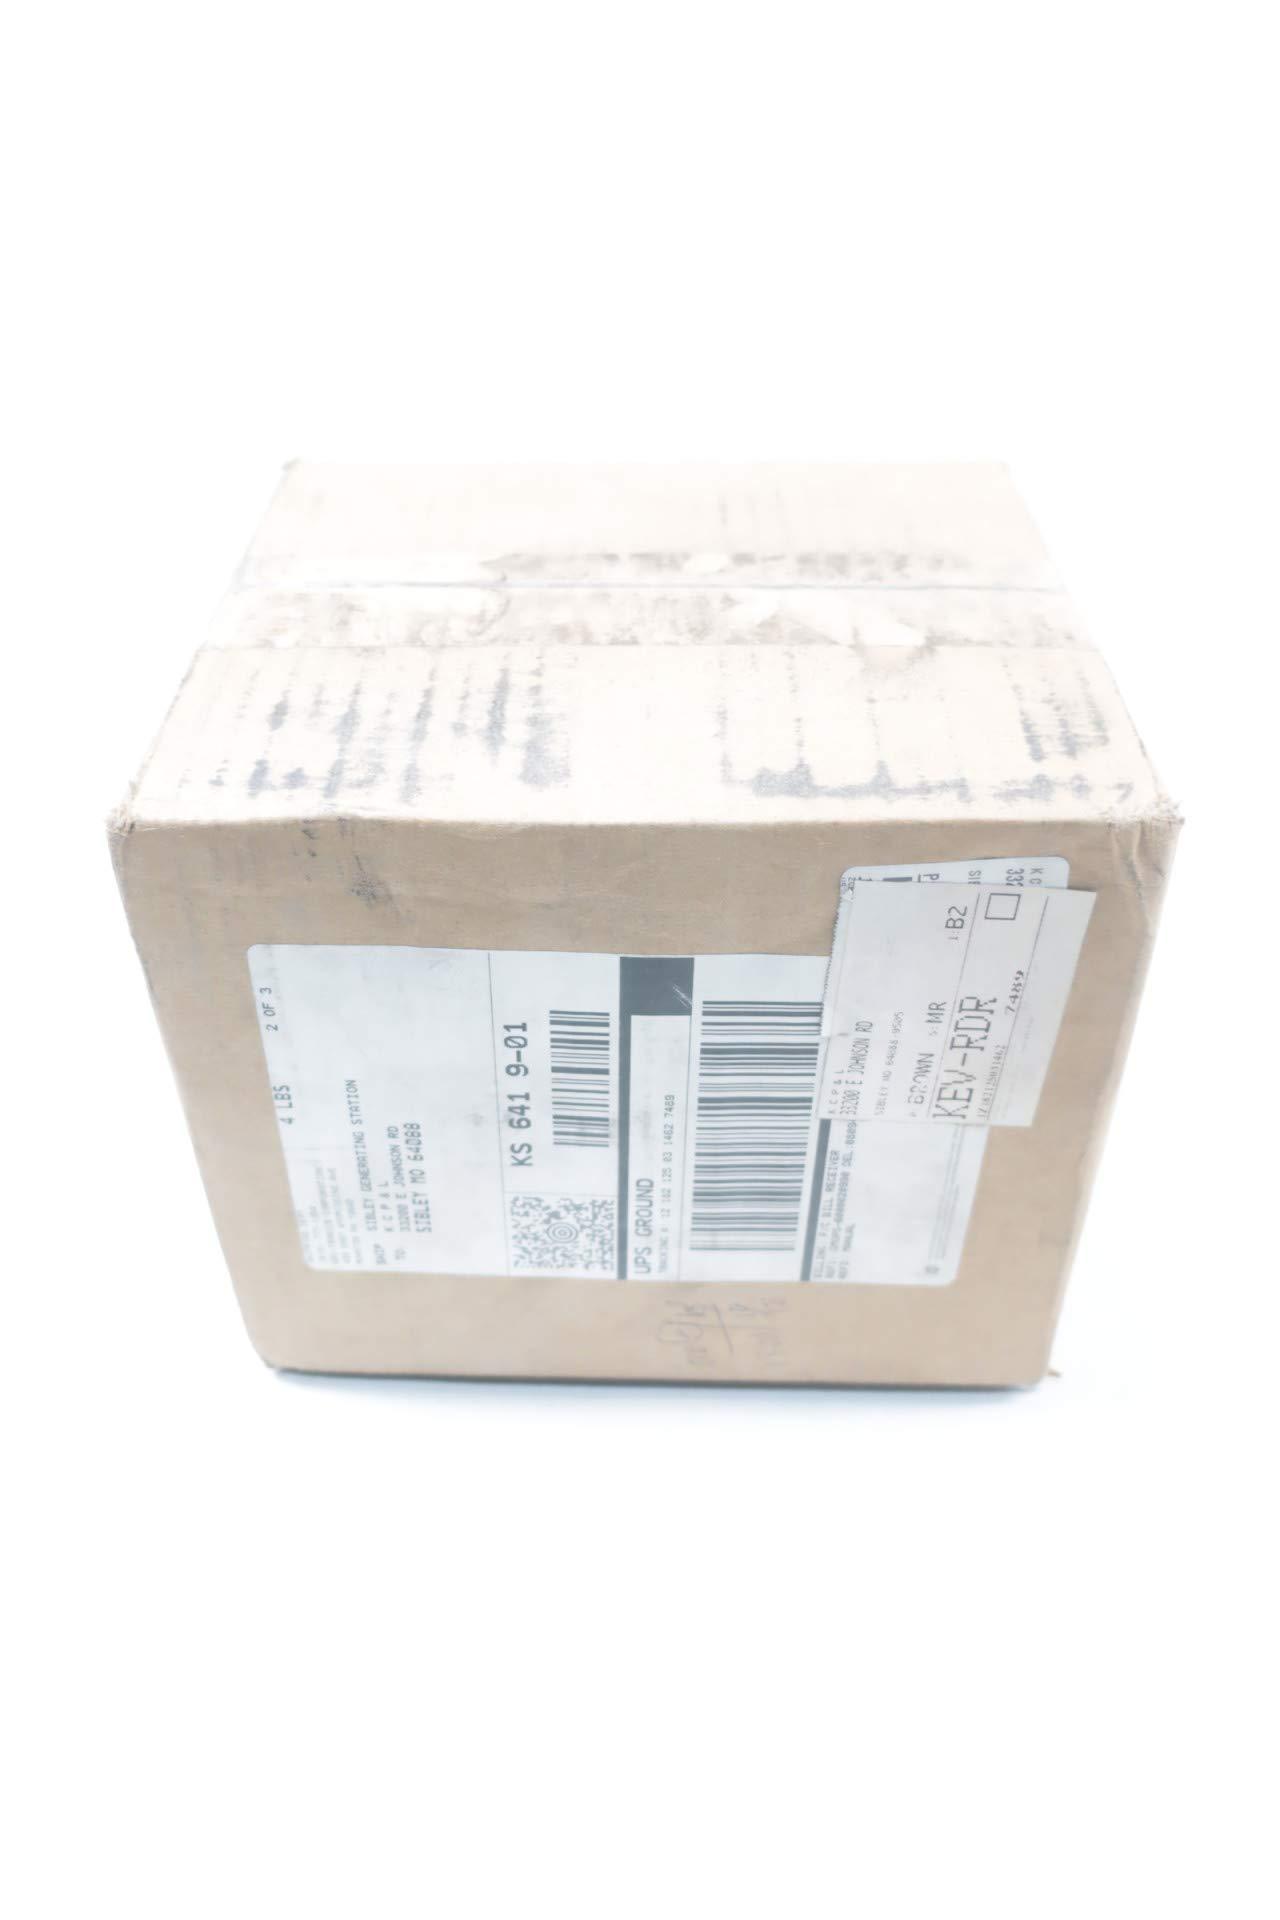 GAI-TRONICS 13314-002 Speaker Driver Unit 30W 16OHM D663352 by Gai-Tronics (Image #3)